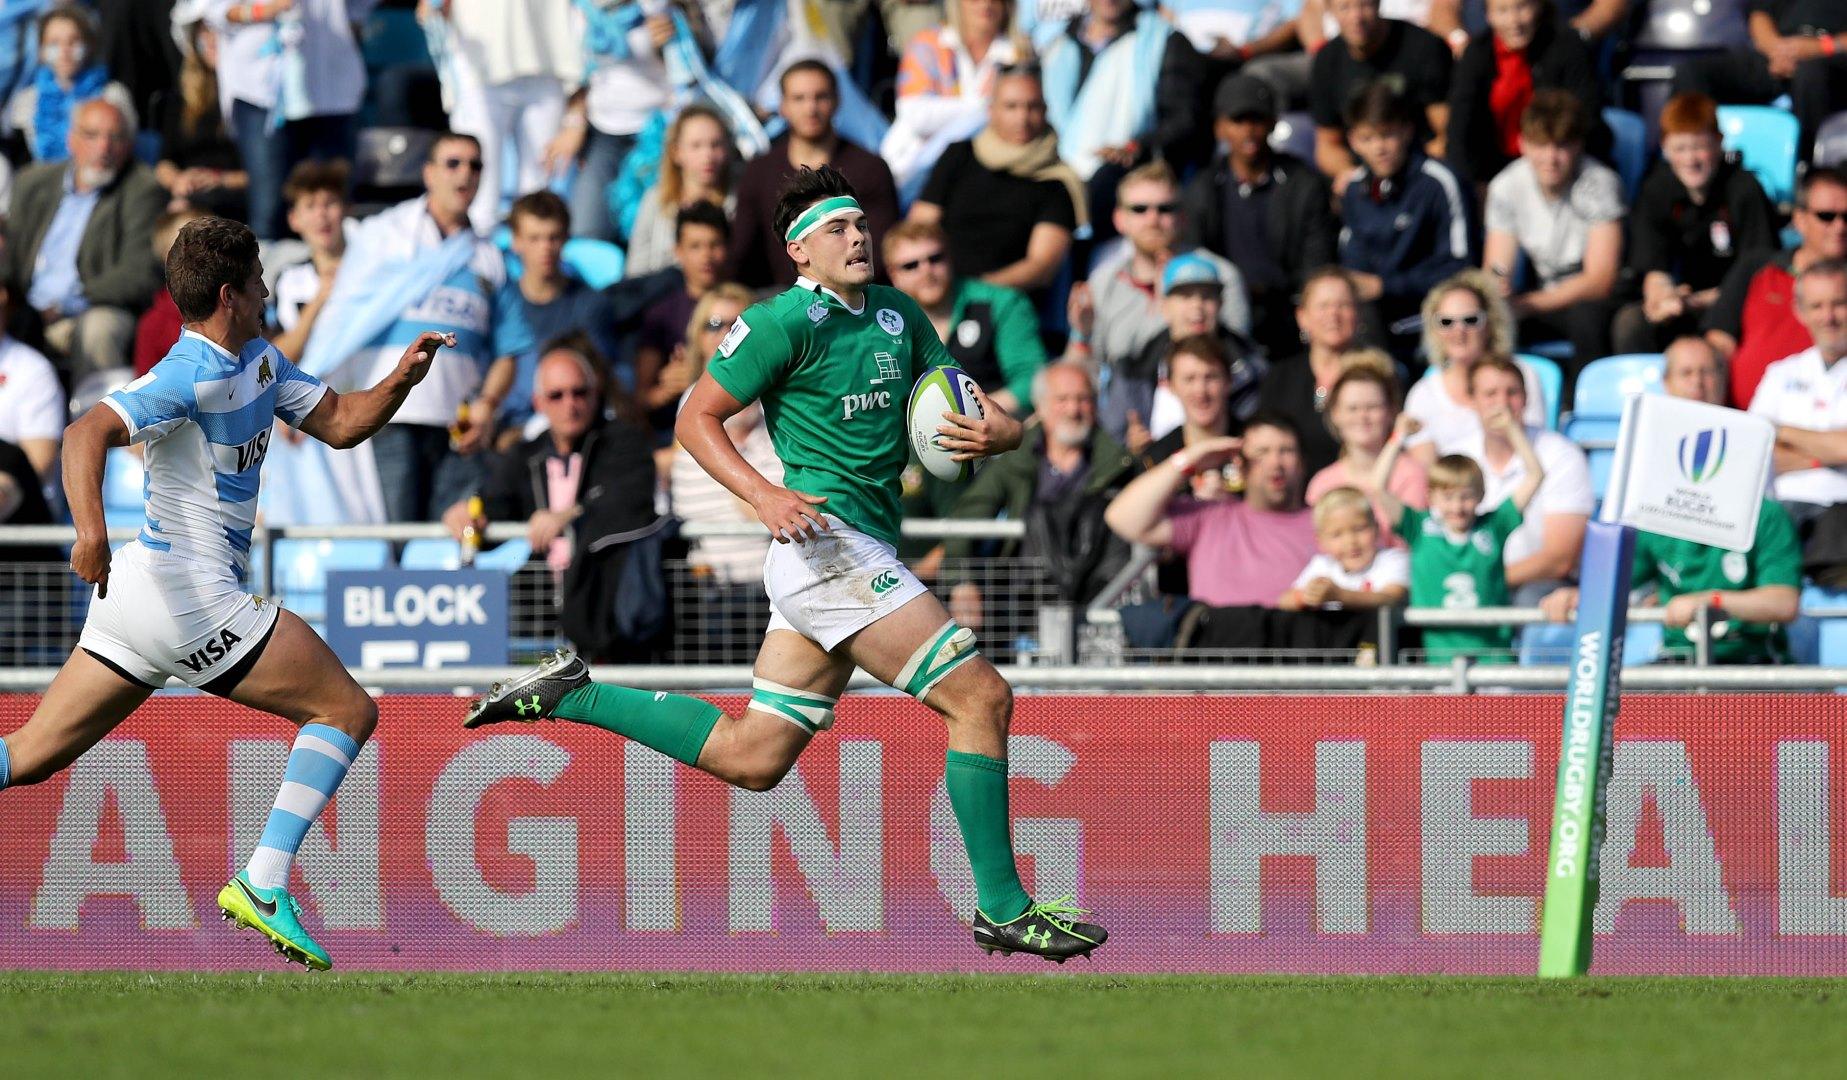 Future bright for Ireland as U20s reach World Championship final